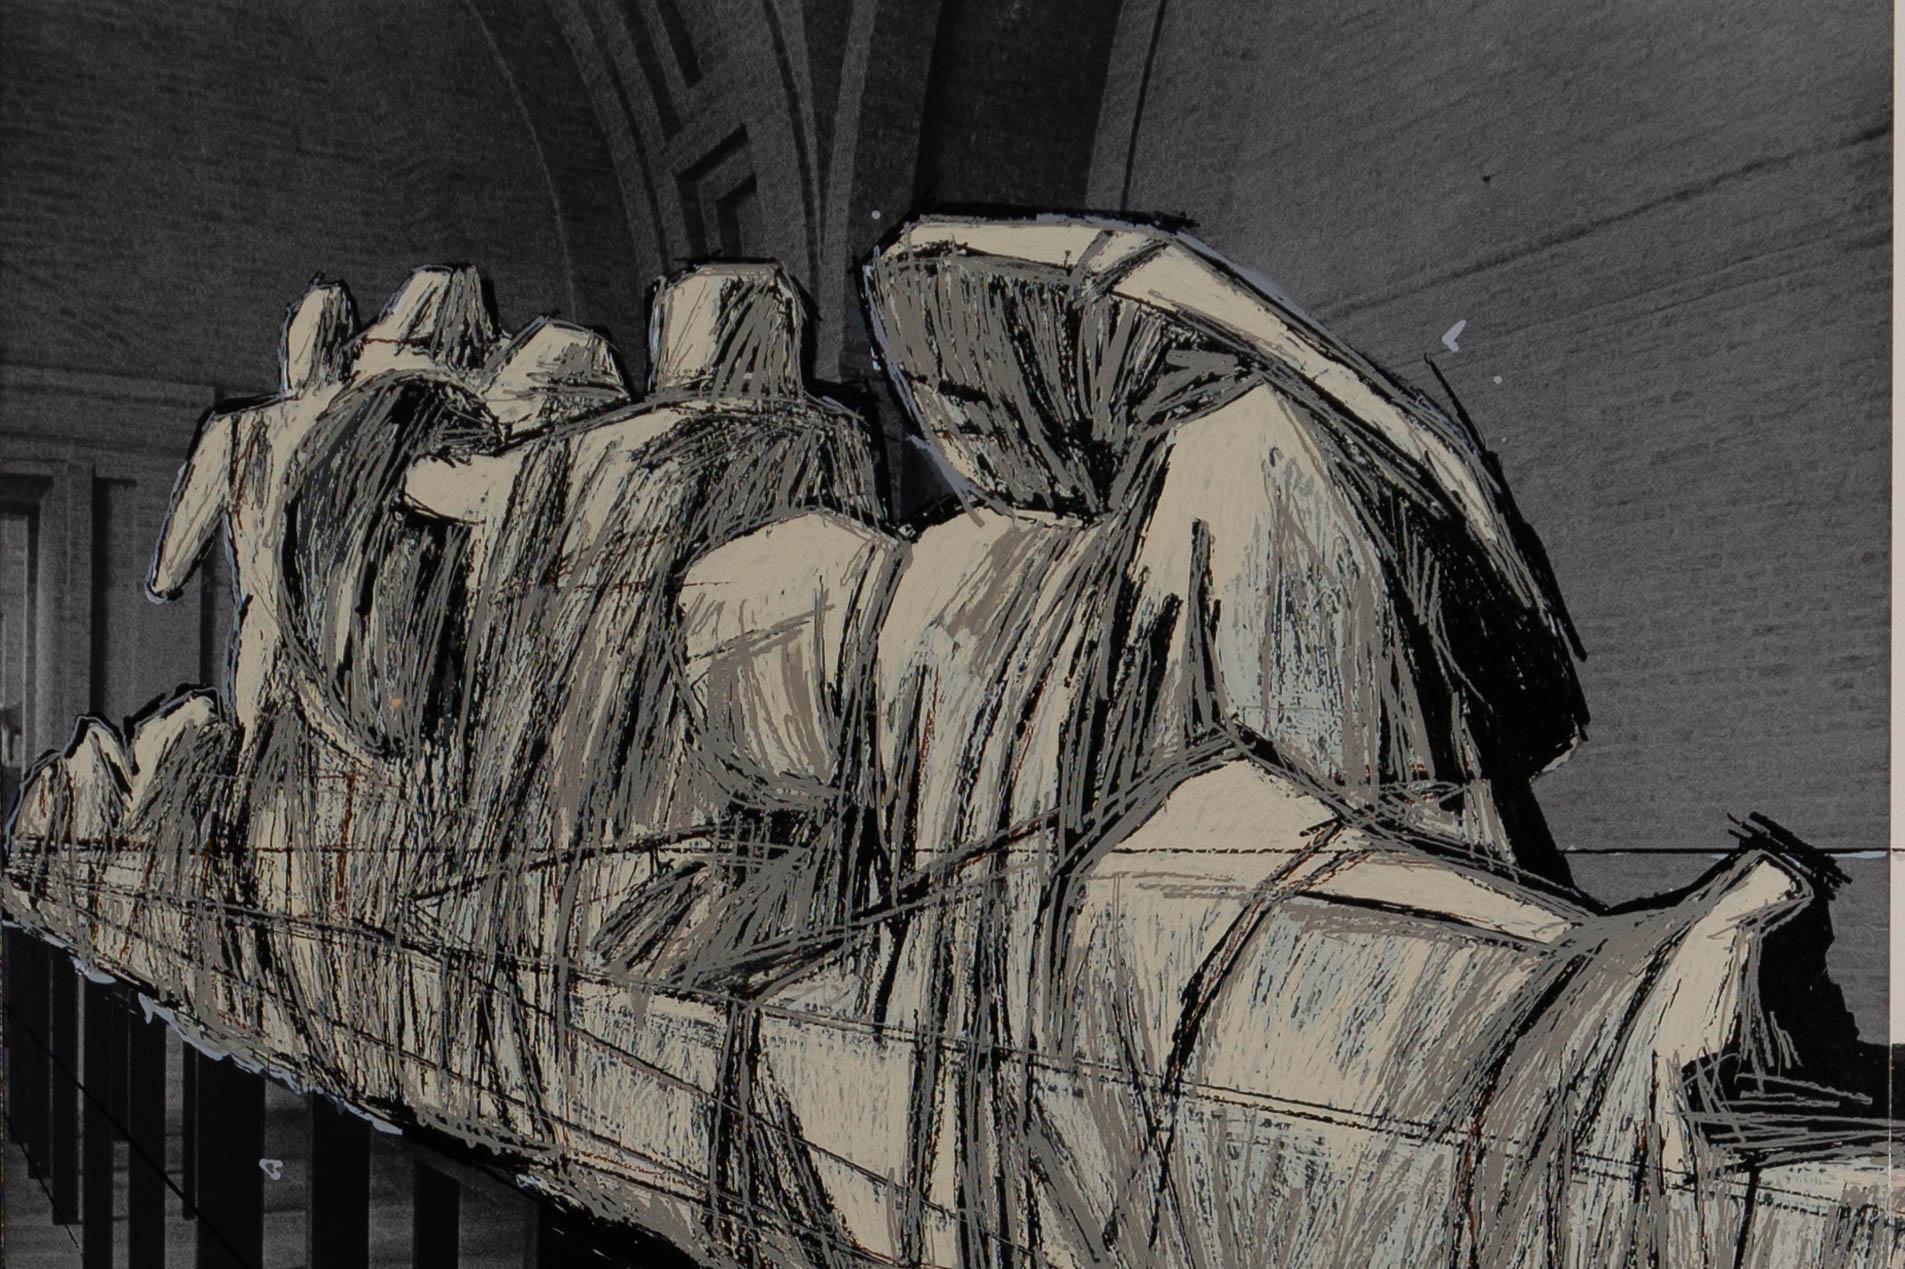 Christo - wrapped figures - detail 12-09-2019 exp (2 van 2)